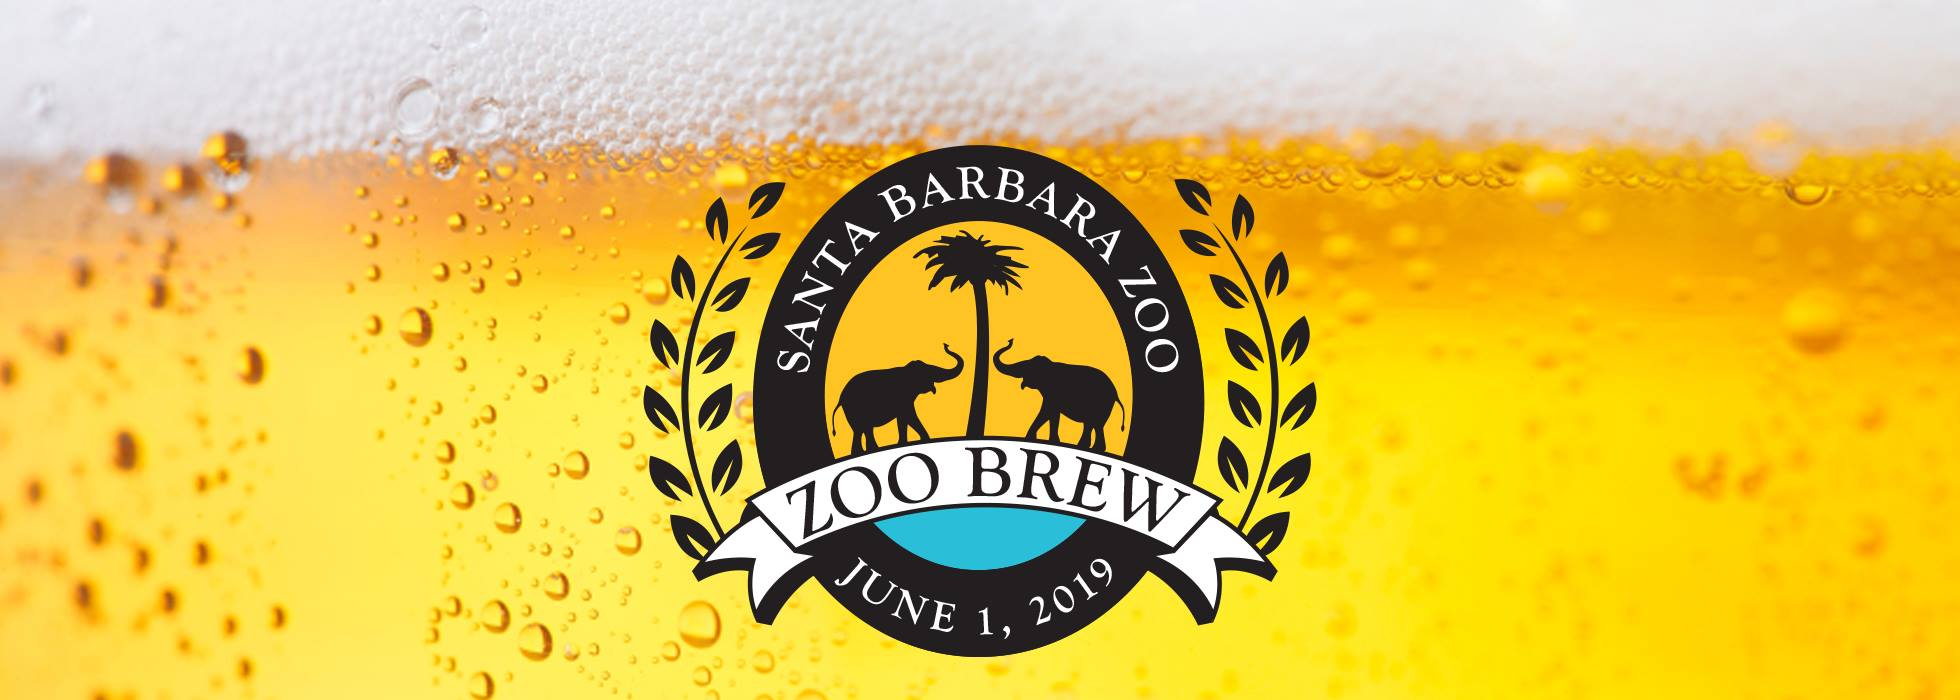 Santa Barbara Zoo Brew 2019